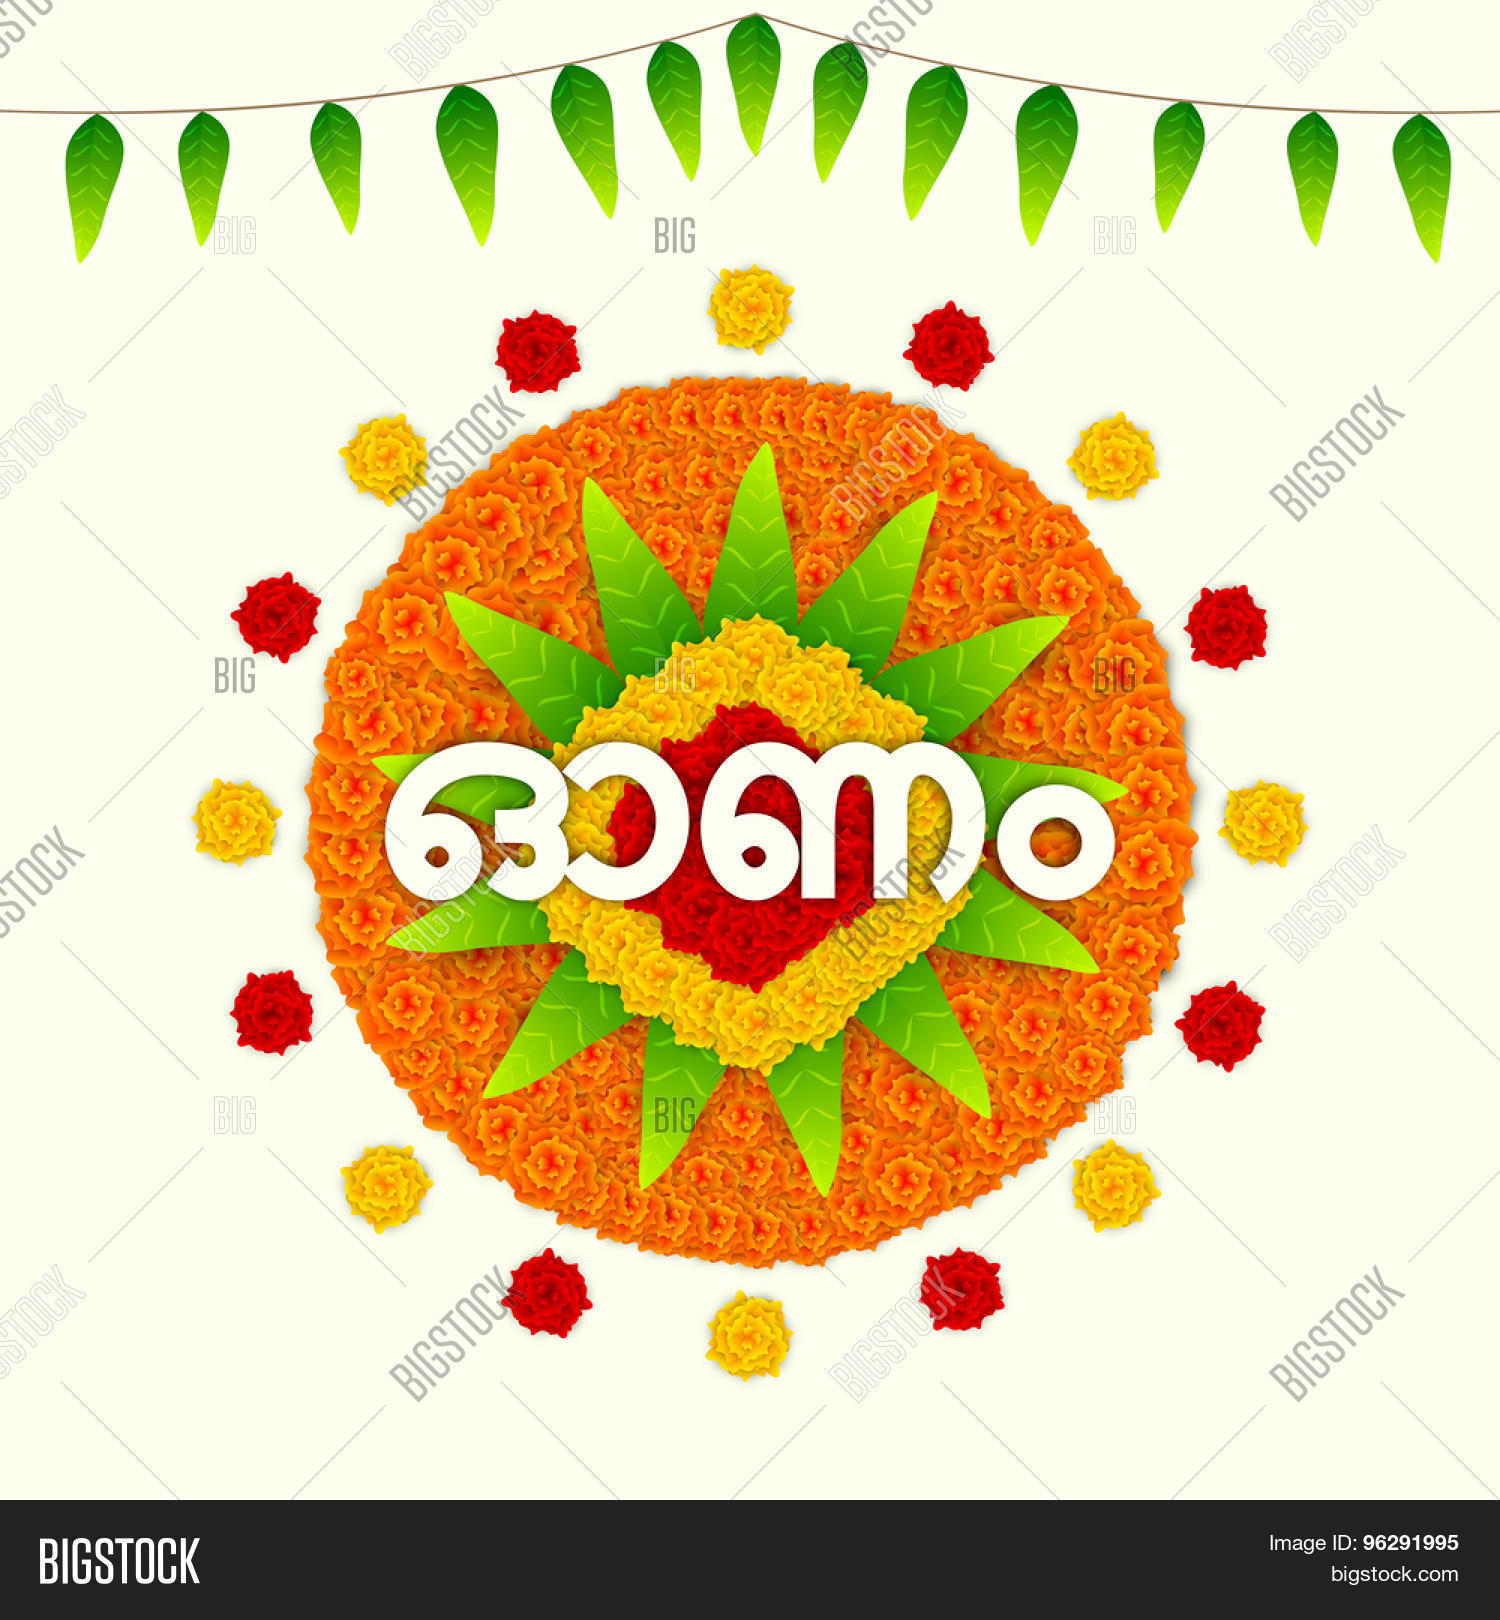 abstract,art,artistic,asian,atham,august,auspicious,background,beautiful,card,celebration,chingam,classic,cochin,colorful,culture,decoration,design,festival,flora,floral,flower,greeting,happiness,happy,hindu,hinduism,holiday,india,indian,invitation,kerala,language,leaves,malayalam,malayali,mango,occasion,onam,pattern,pookolam,rangoli,religion,religious,ritual,september,shape,shiny,south,spiritual,sravanmahotsav,tamil,thiruvonam,traditional